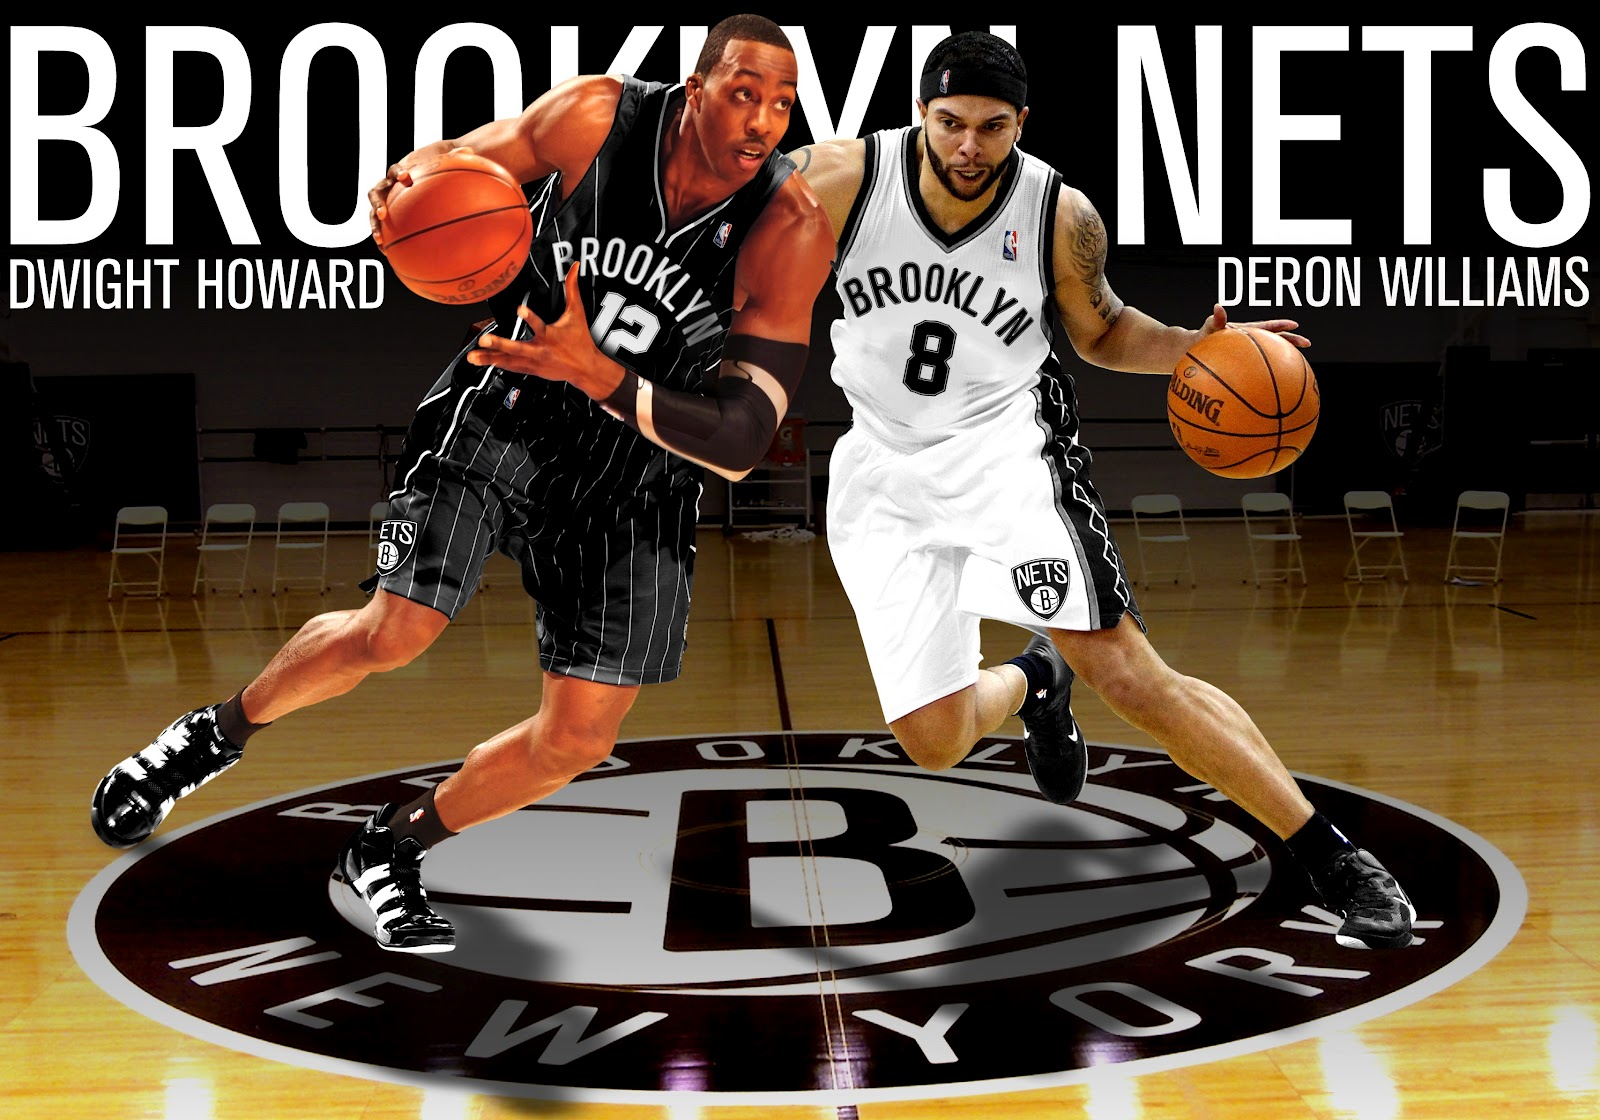 20487d42c Nets fan has designs on Dwight Howard - Visuals - ESPN Playbook- ESPN